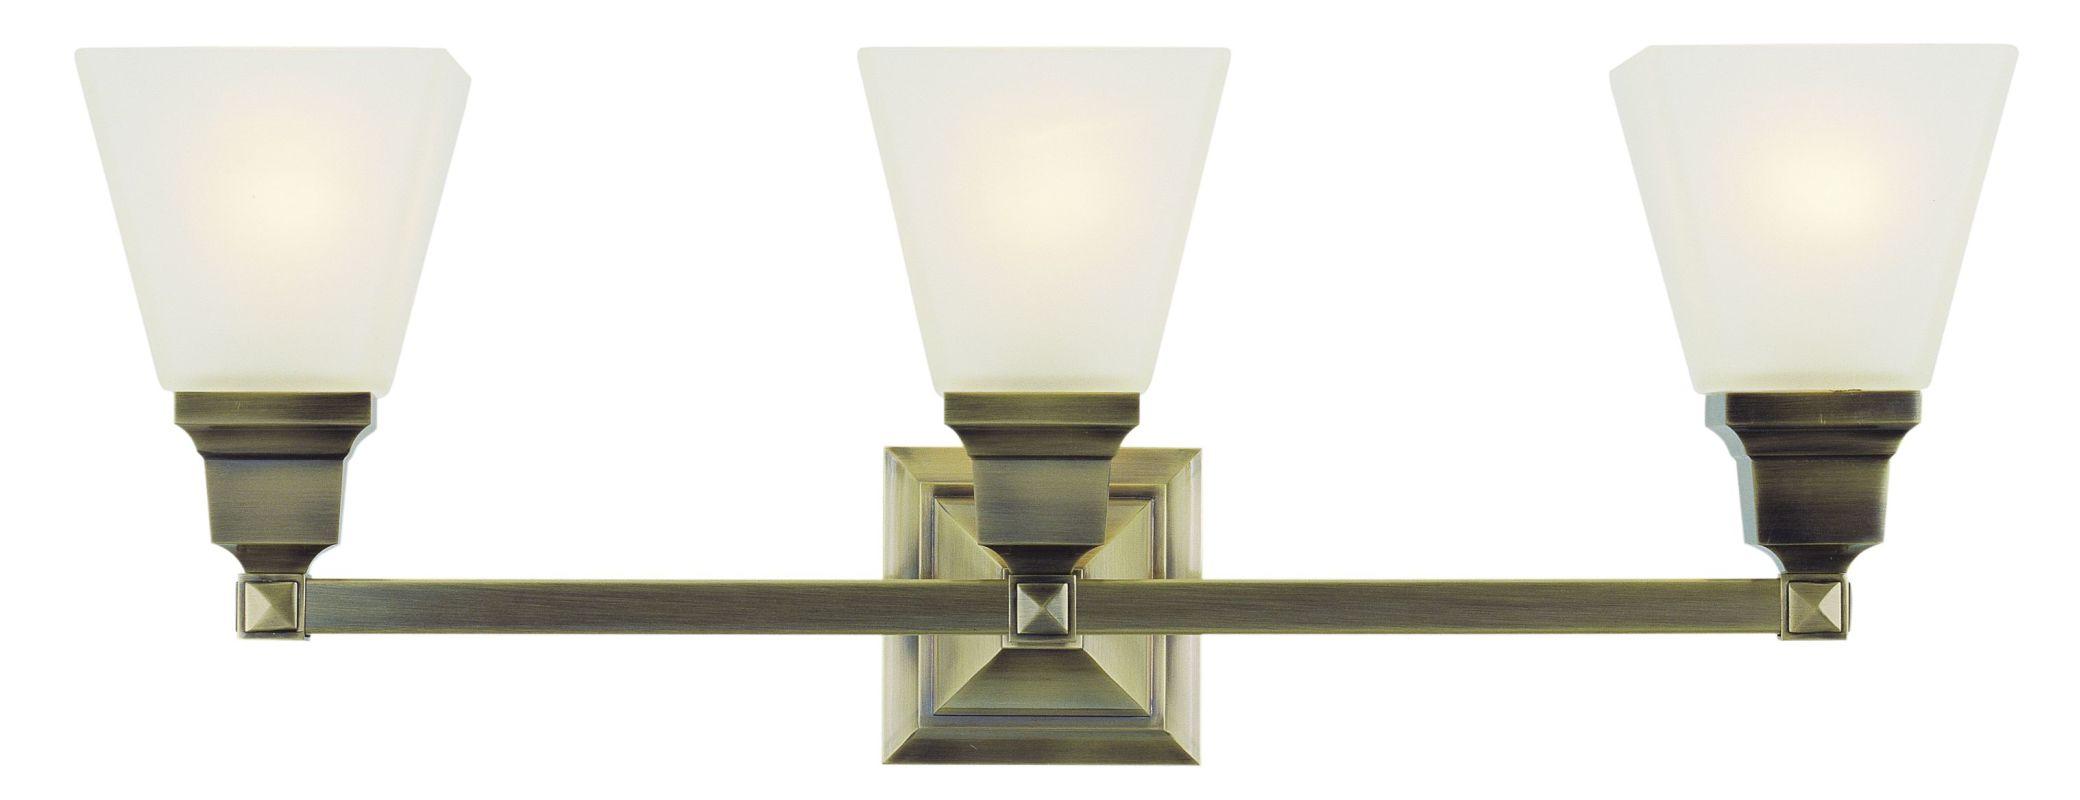 New 3 Light Bathroom Vanity Lighting Fixture Antique Brass: Livex Lighting 1033-01 Antique Brass Mission 3 Light